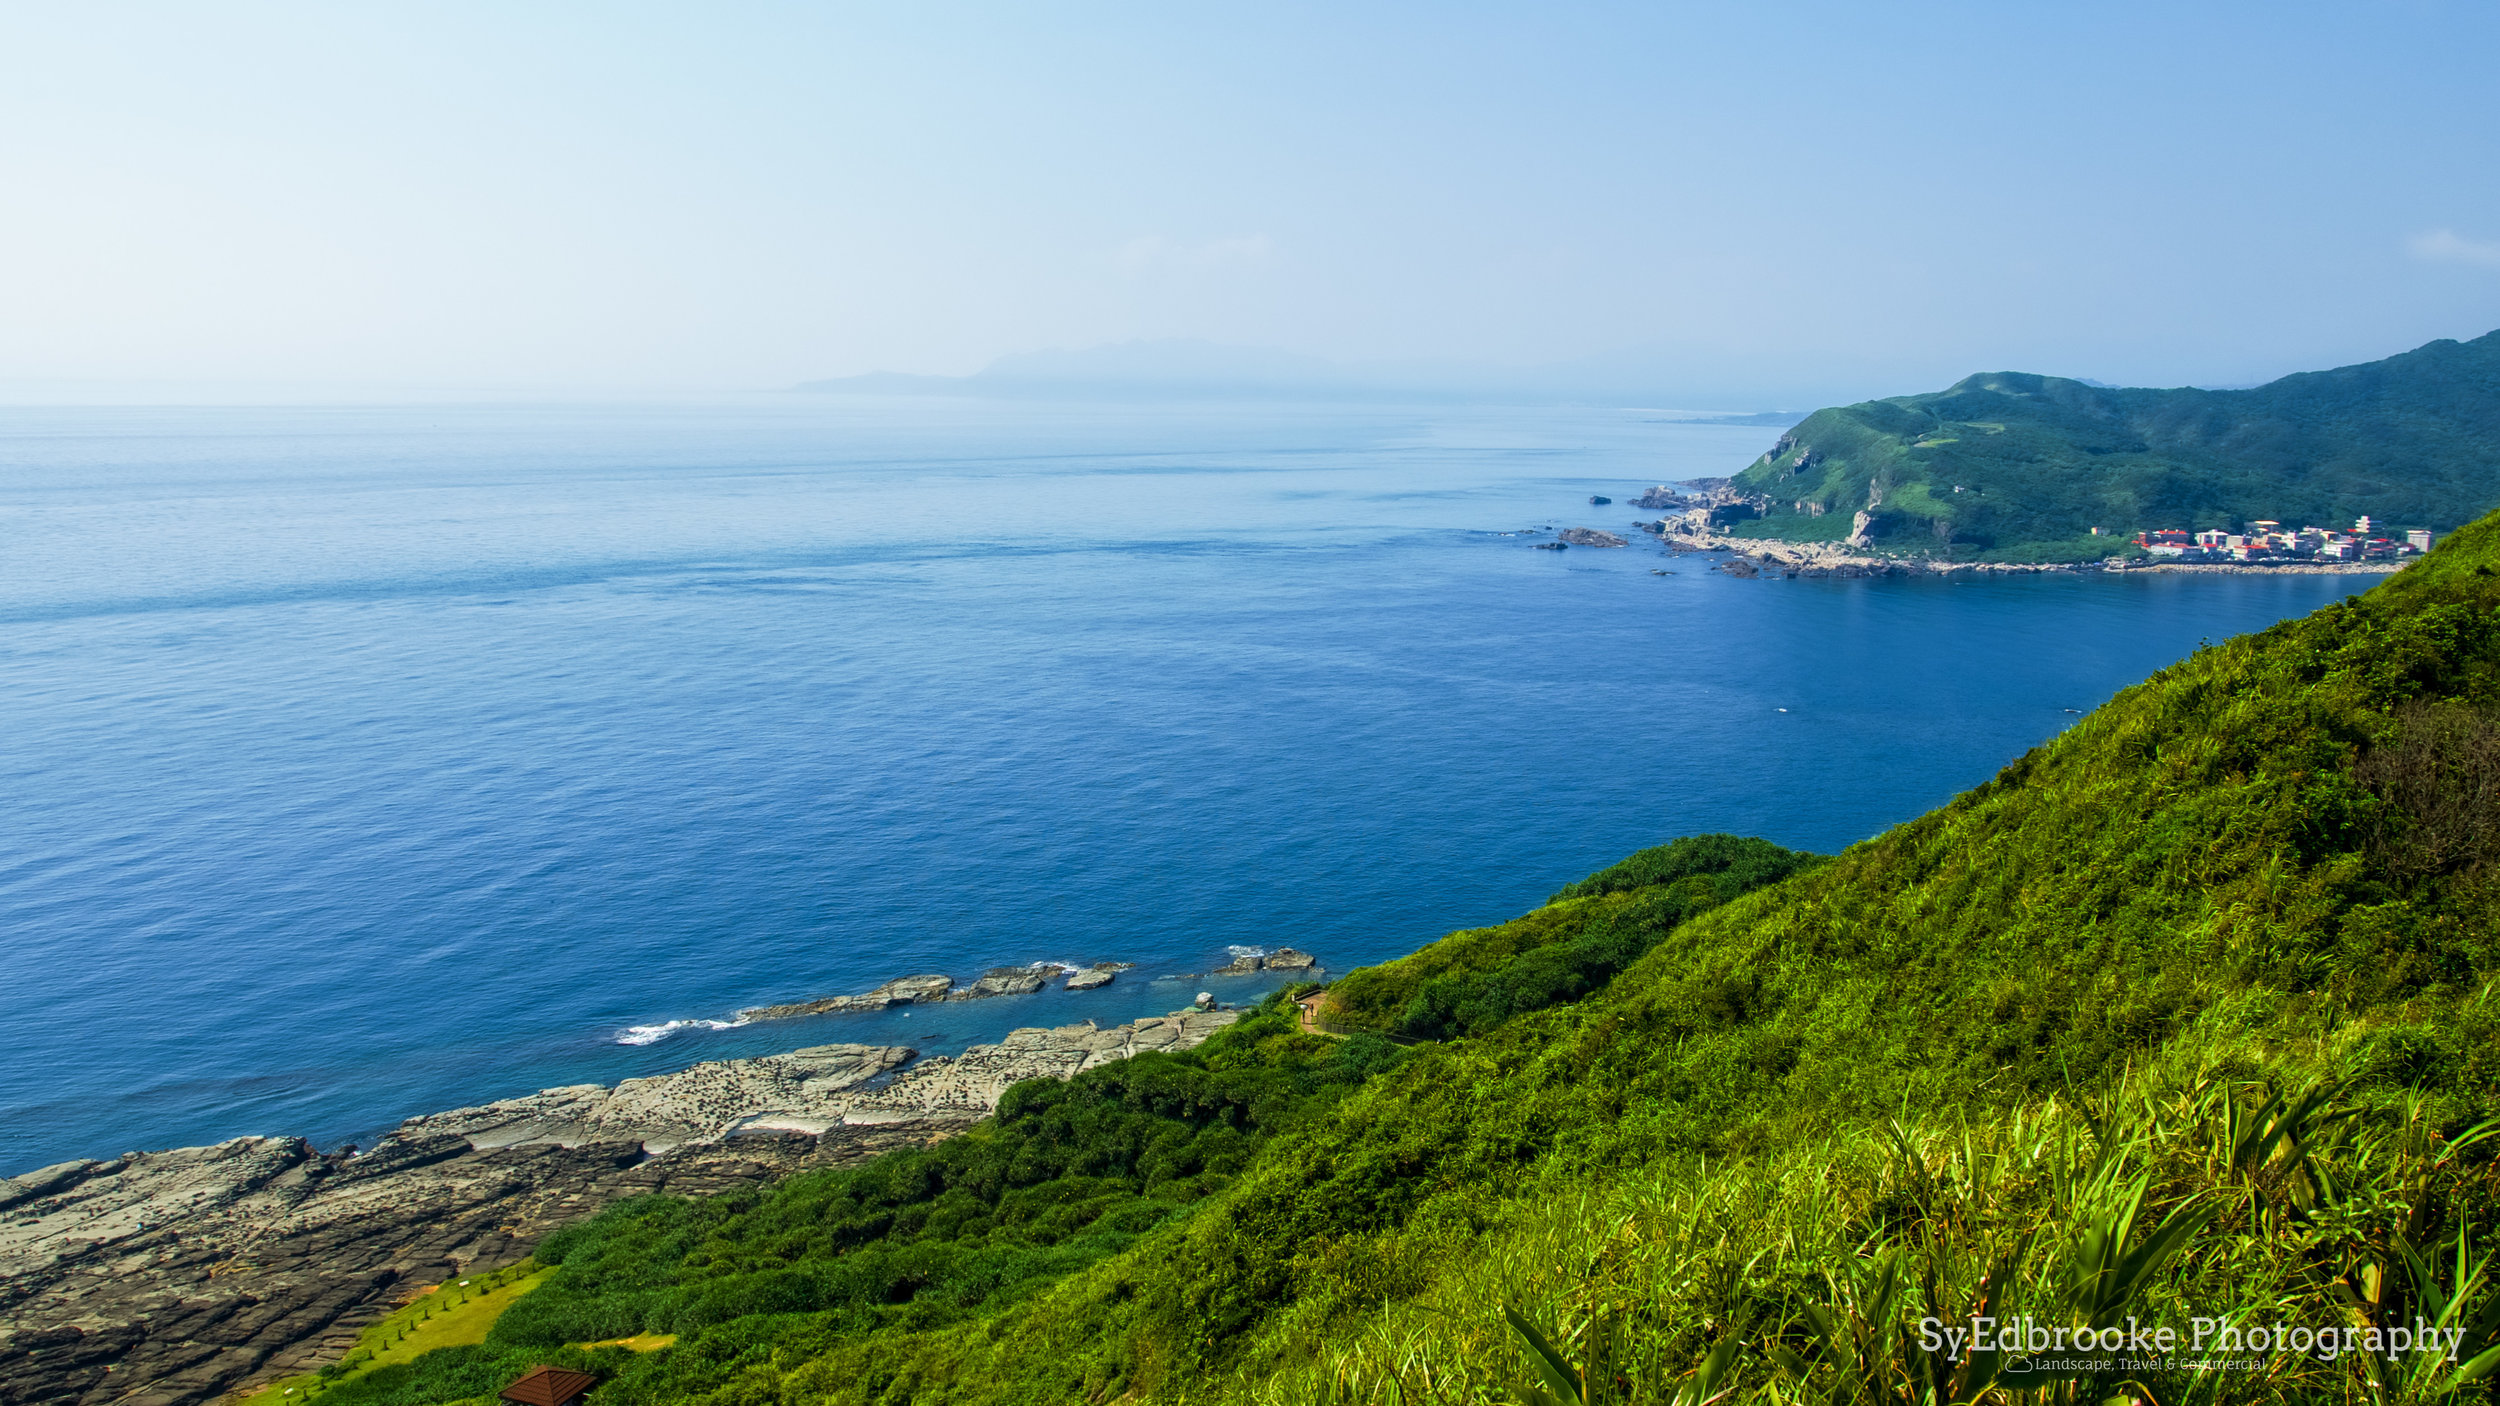 The coast looking towards Fulong. f3.5, ISO 100, 1/400, 90mm